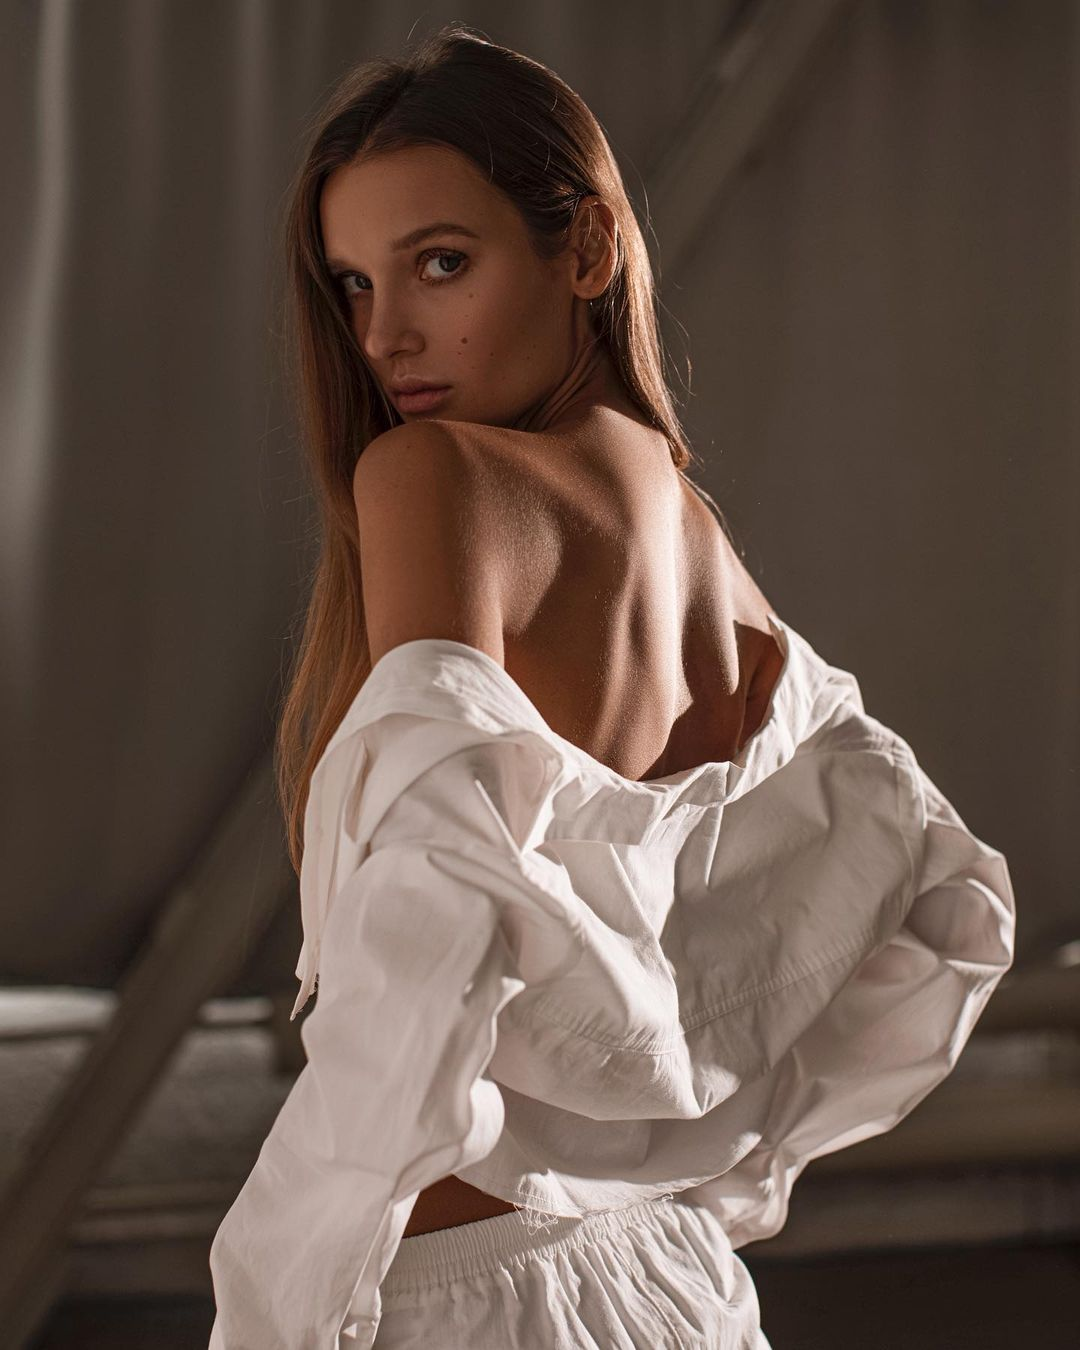 Ksenia Vinogradova by Natasha Motorina